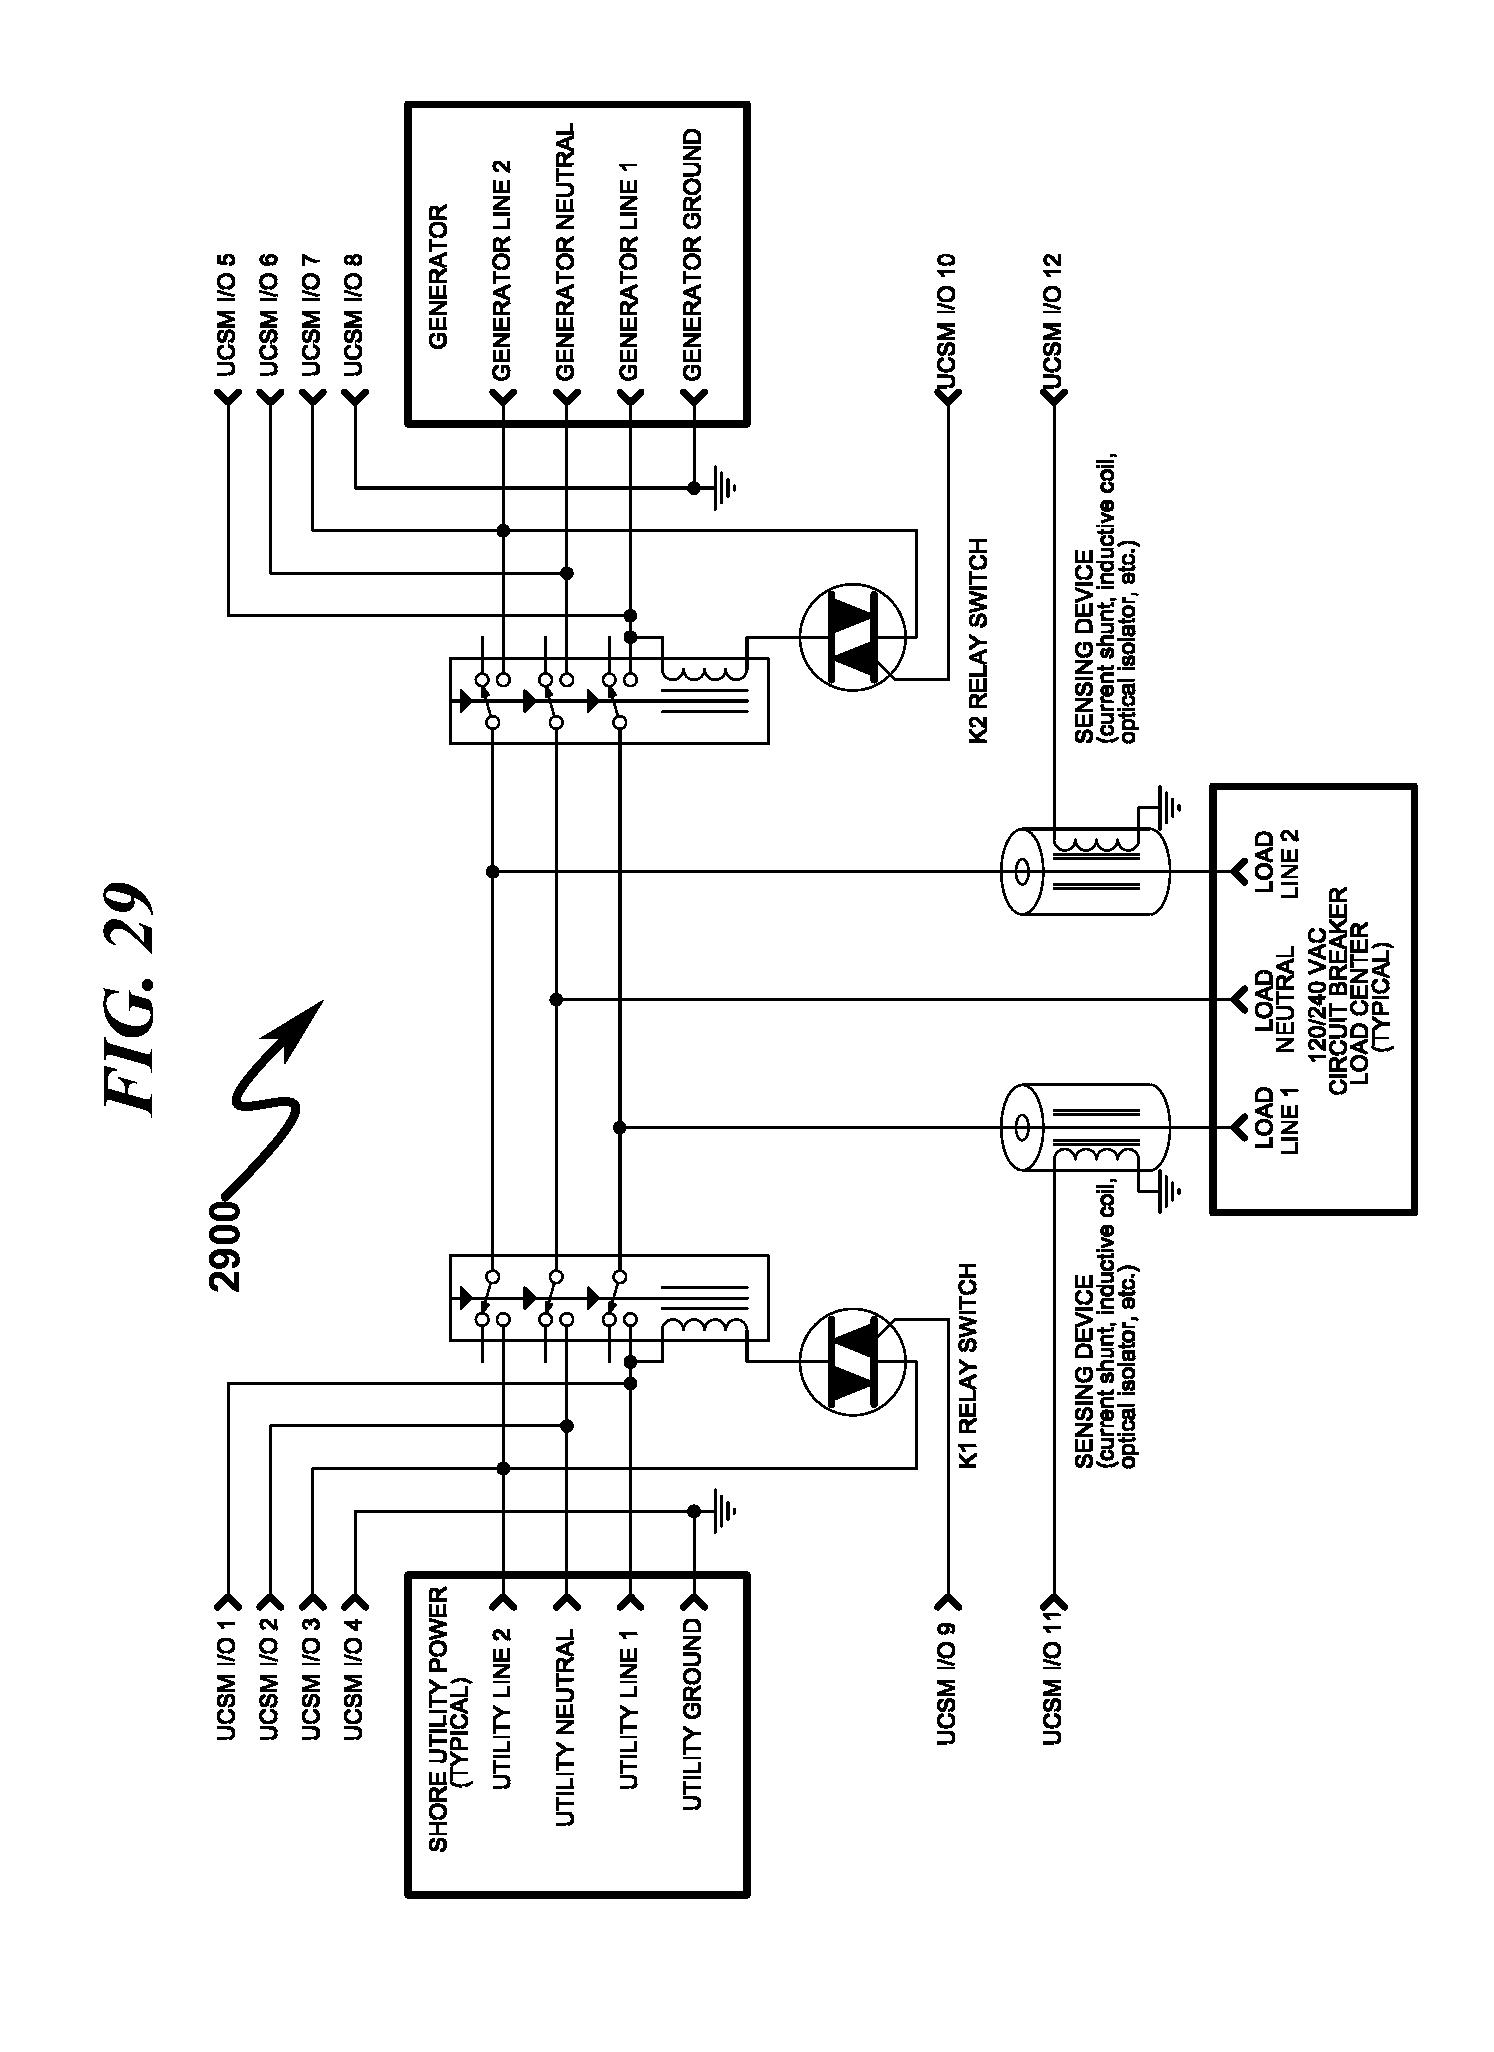 magnetek motor wiring diagram three circle venn printable relay and power inverter